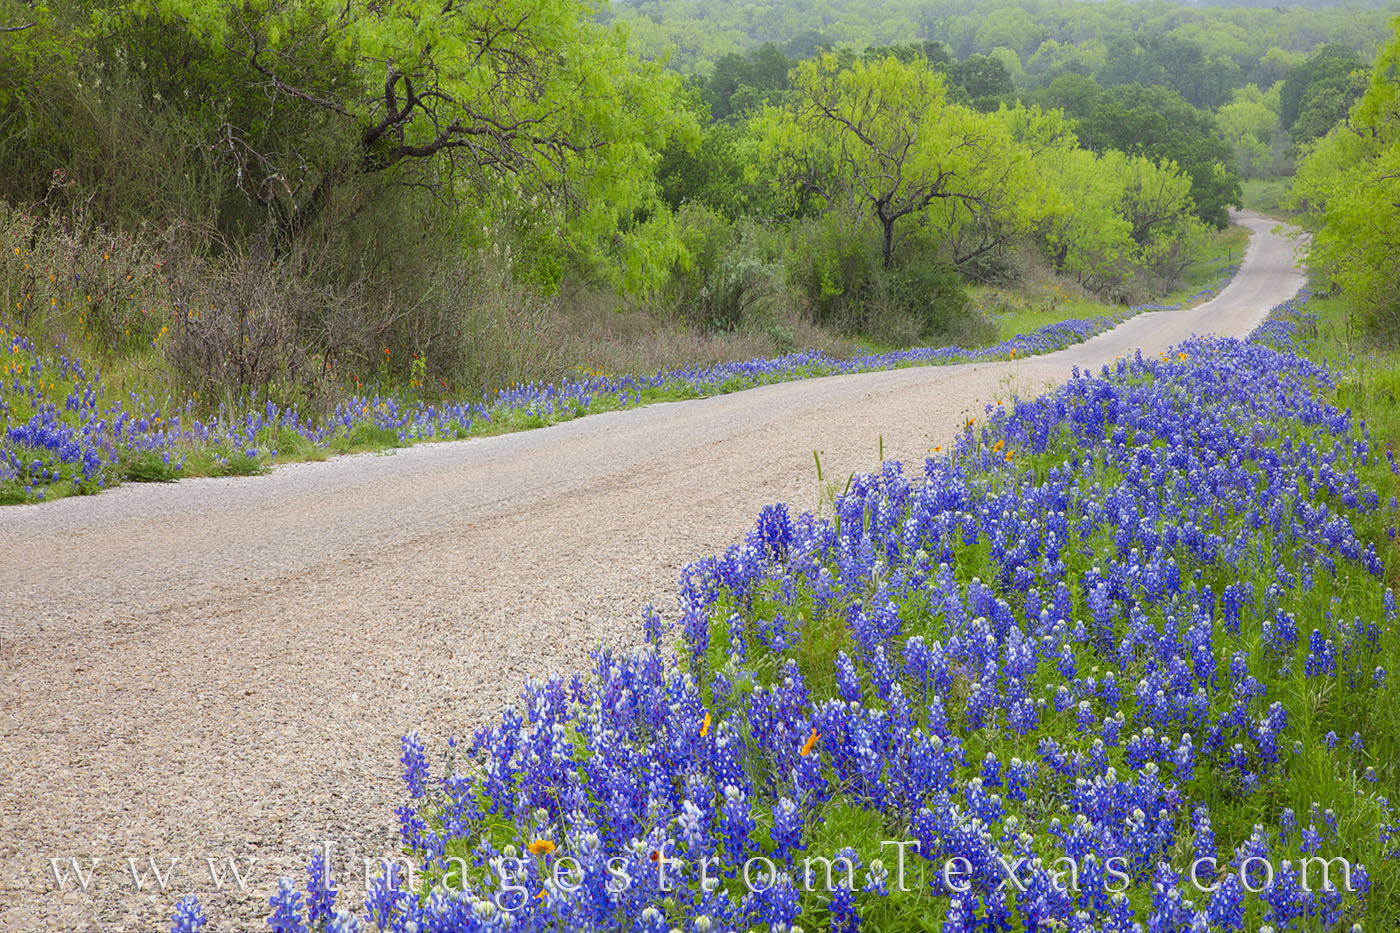 bluebonnets, best bluebonnet drives, bluebonnet roads, texas hill country, bluebonnet roads, backroads, exploring, green, escape, photo